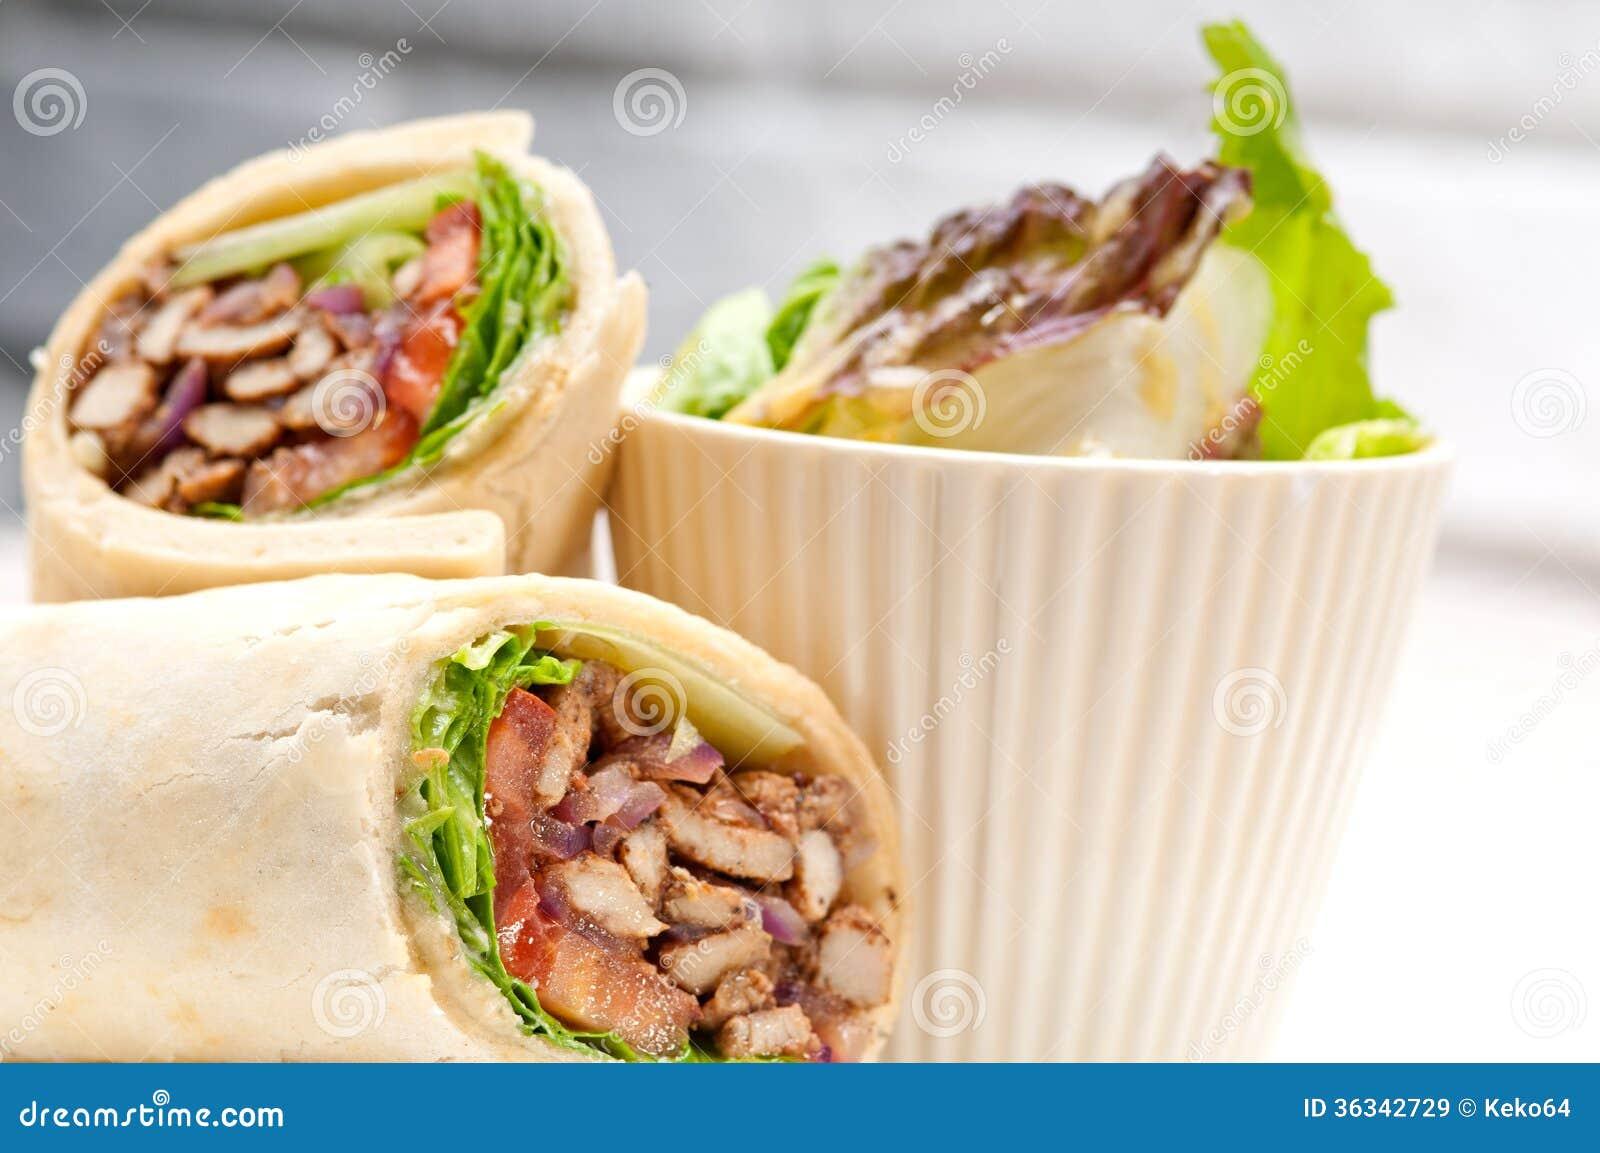 Chicken shawarma roll - photo#20